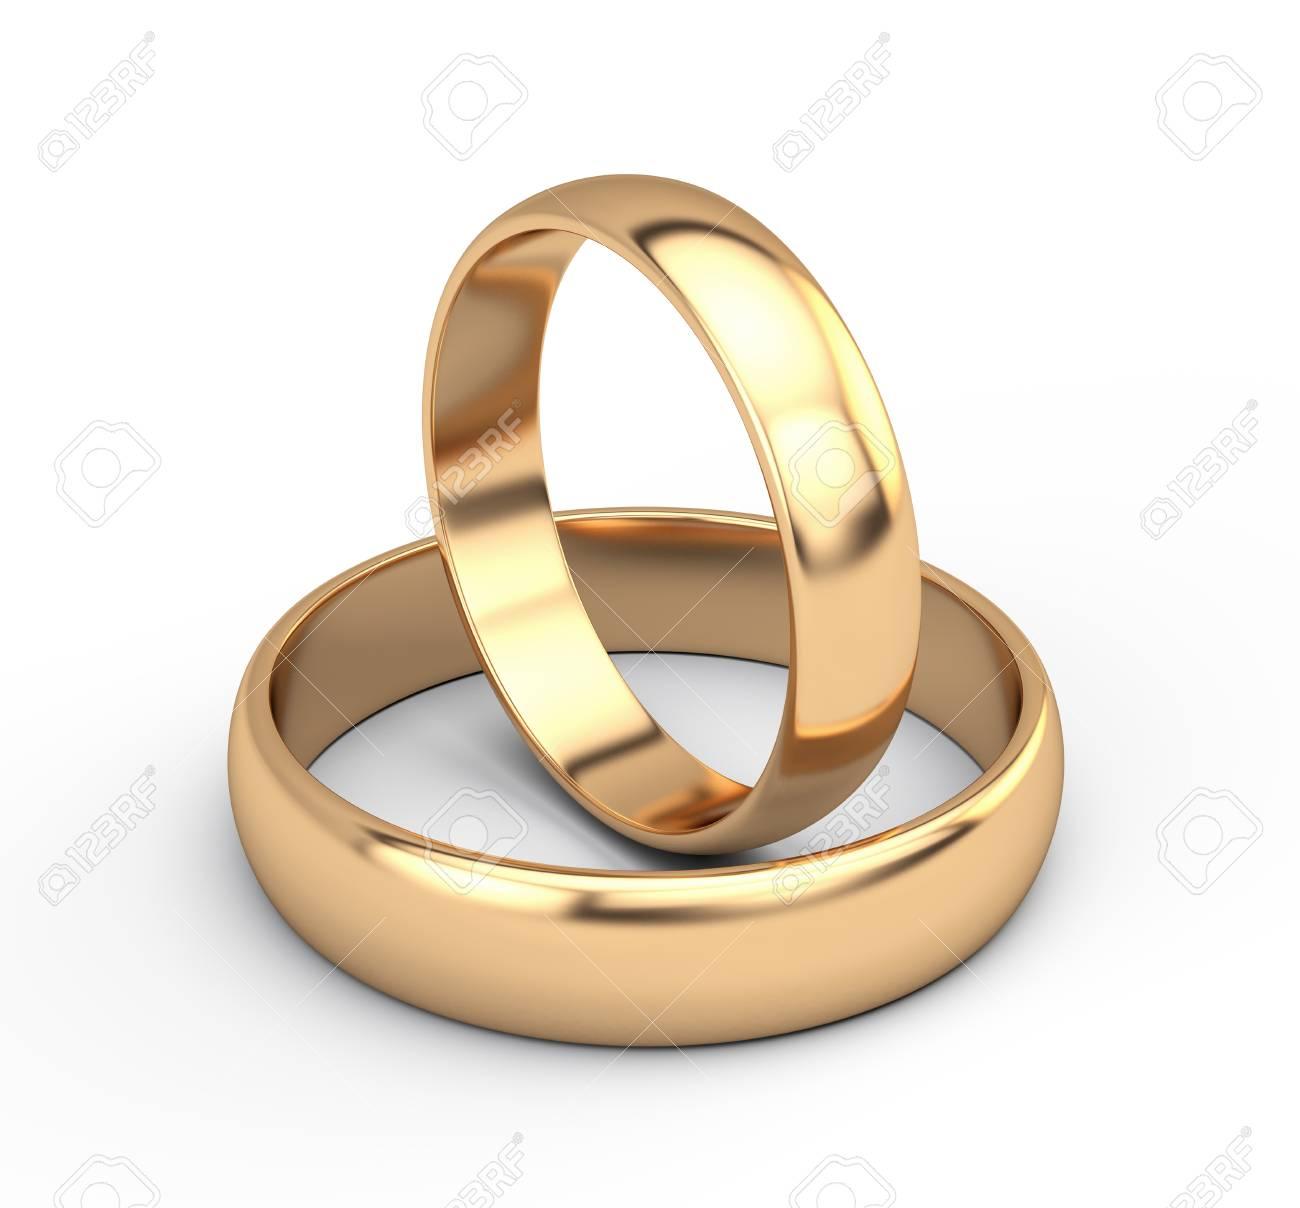 Golden wedding rings - 125873117